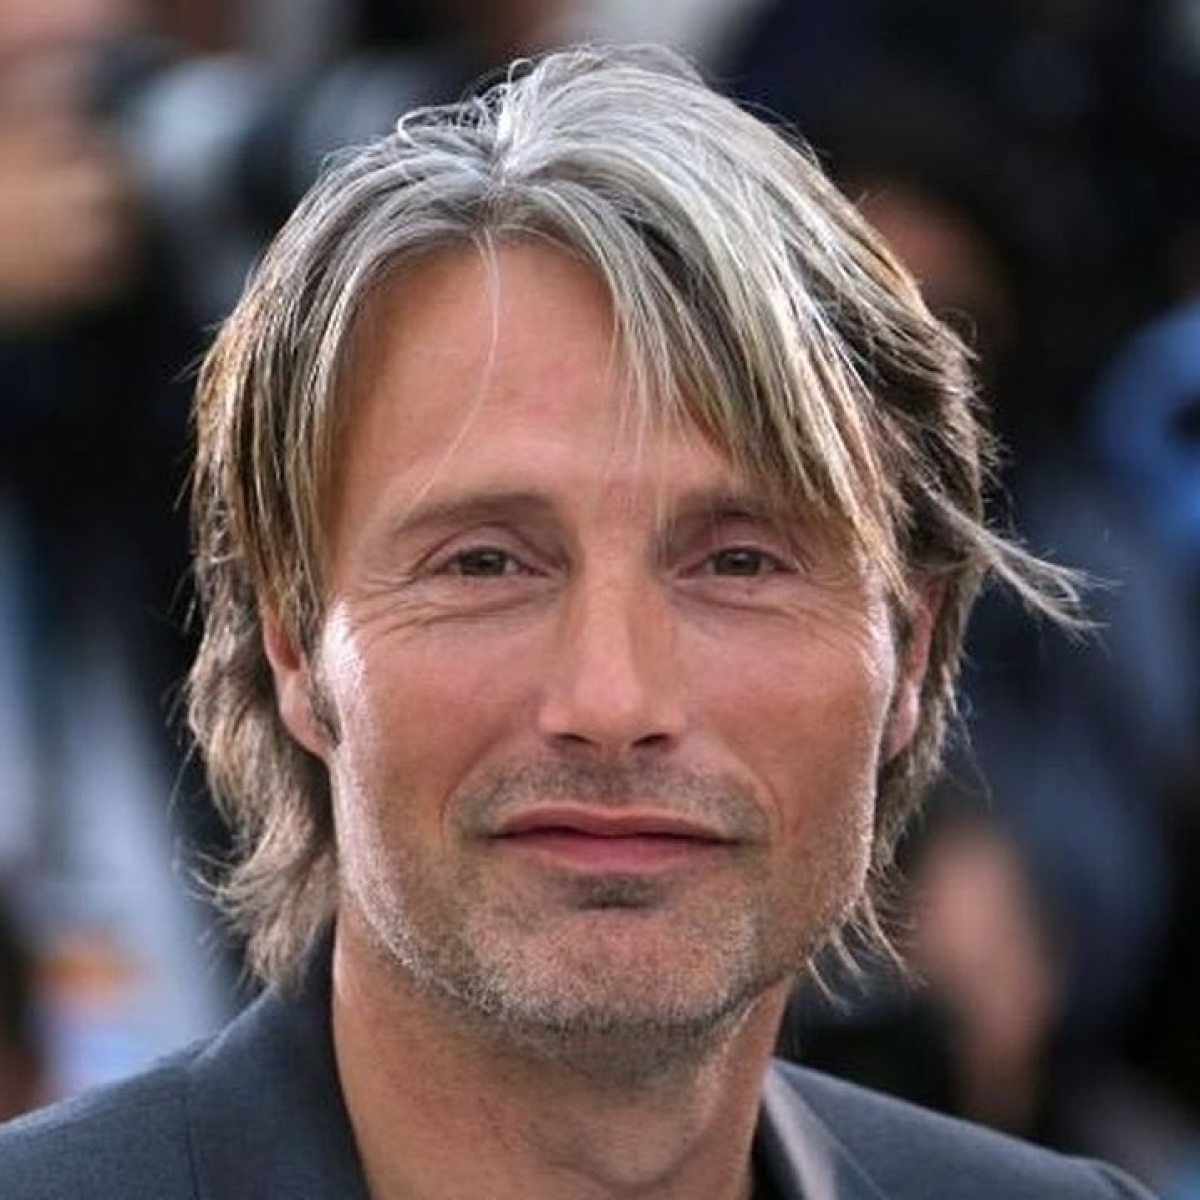 'Hannibal' actor Mads Mikkelsen to play Grindlewald after Johnny Depp's exit in 'Fantastic Beasts 3'